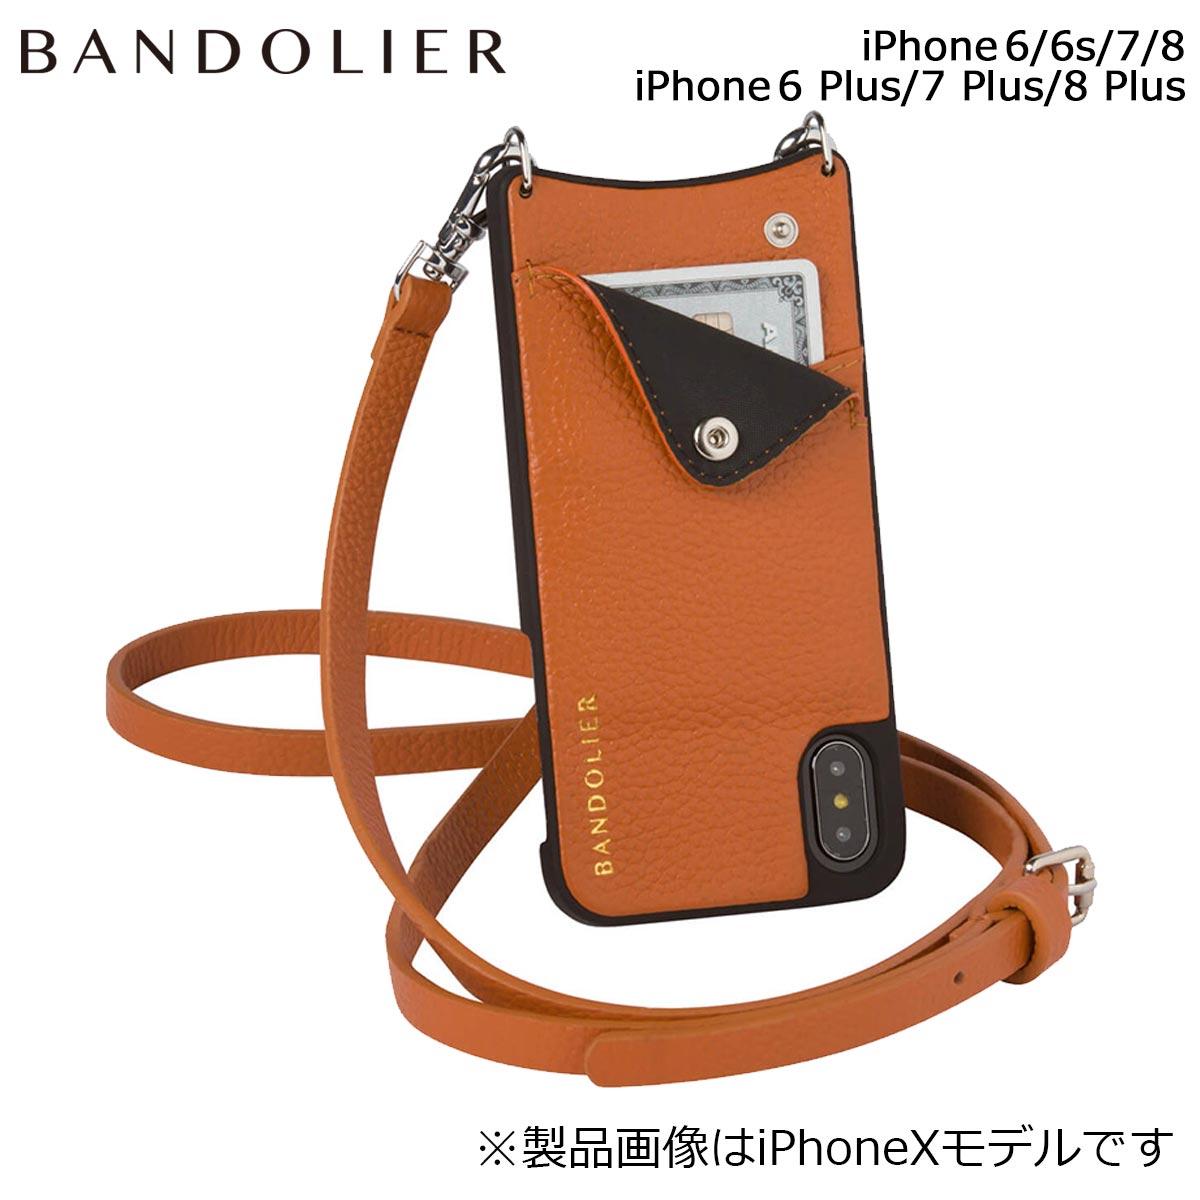 BANDOLIER EMMA COGNAC バンドリヤー iPhone8 iPhone7 7Plus 6s ケース スマホ アイフォン プラス メンズ レディース ブラウン [9/14 追加入荷]